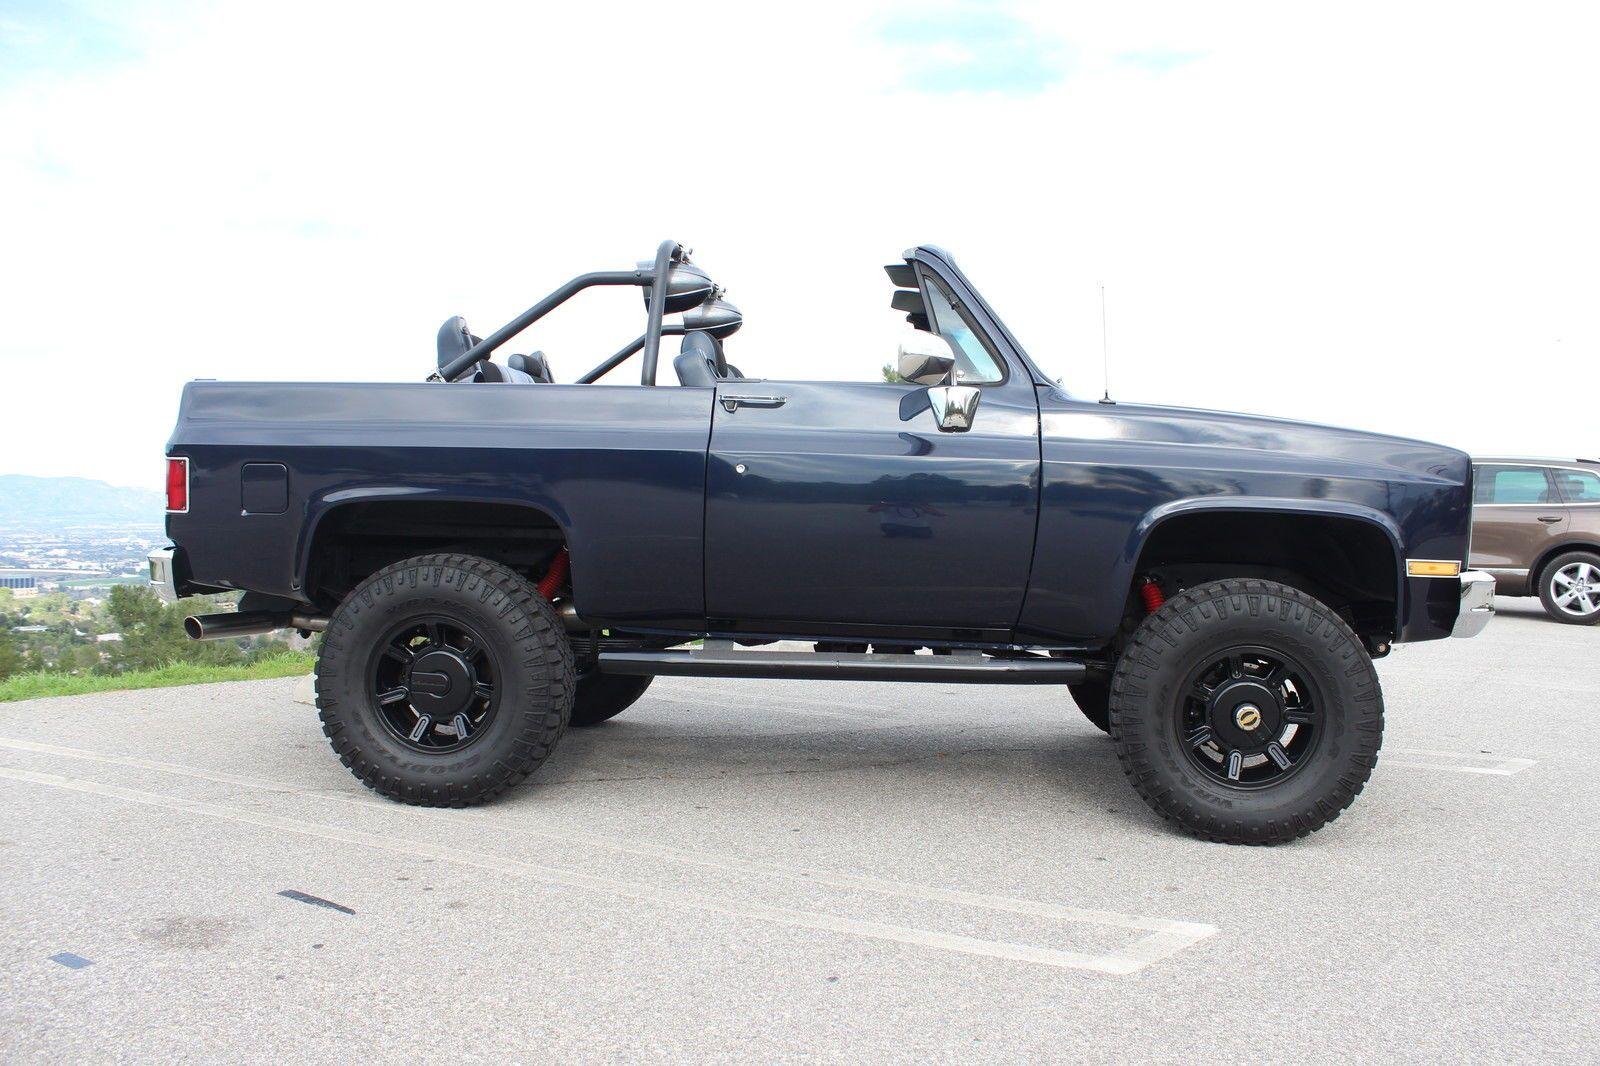 Lifted Chevrolet classic Trucks | Lifted Classic trucks | Pinterest ...